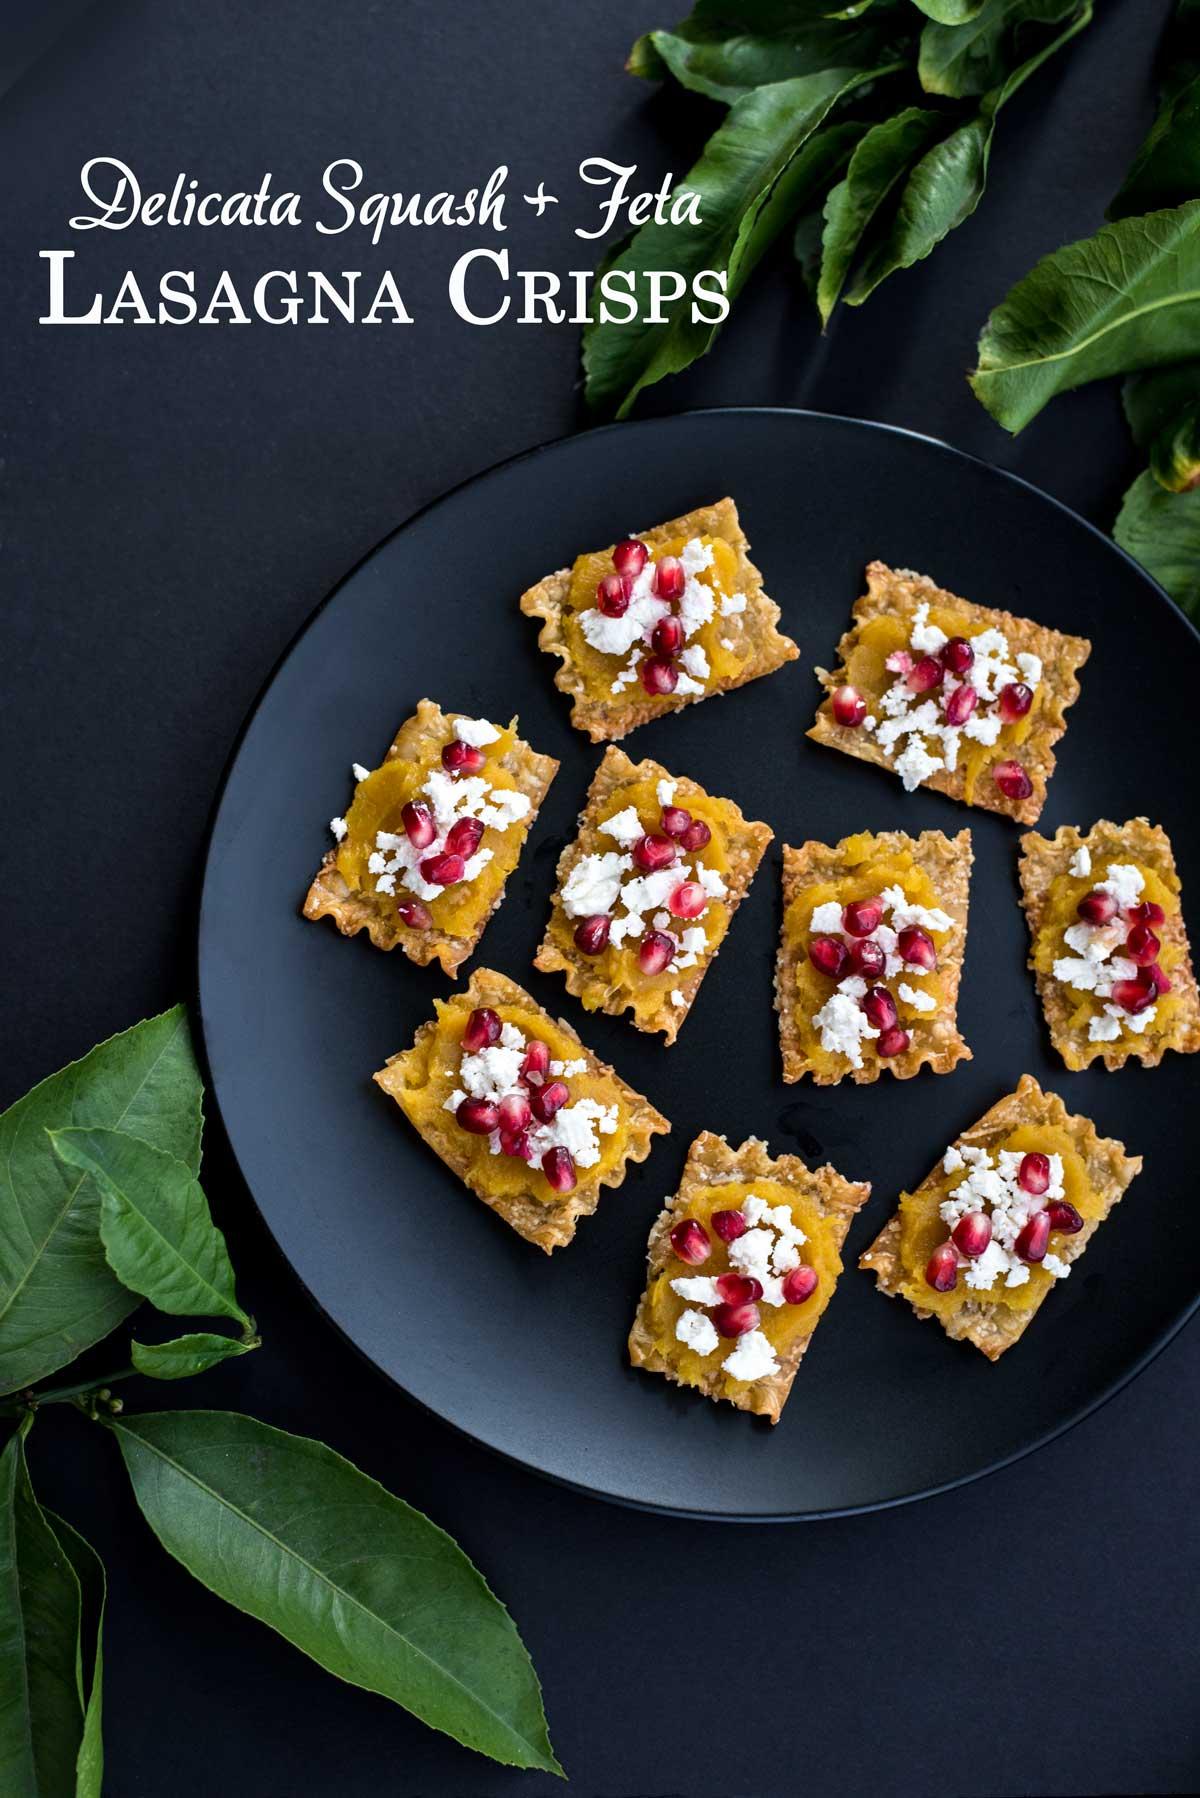 Easy Appetizer Idea - Baked Lasagna Crisps with Delicata Squash, Feta and Pomegranates Recipe